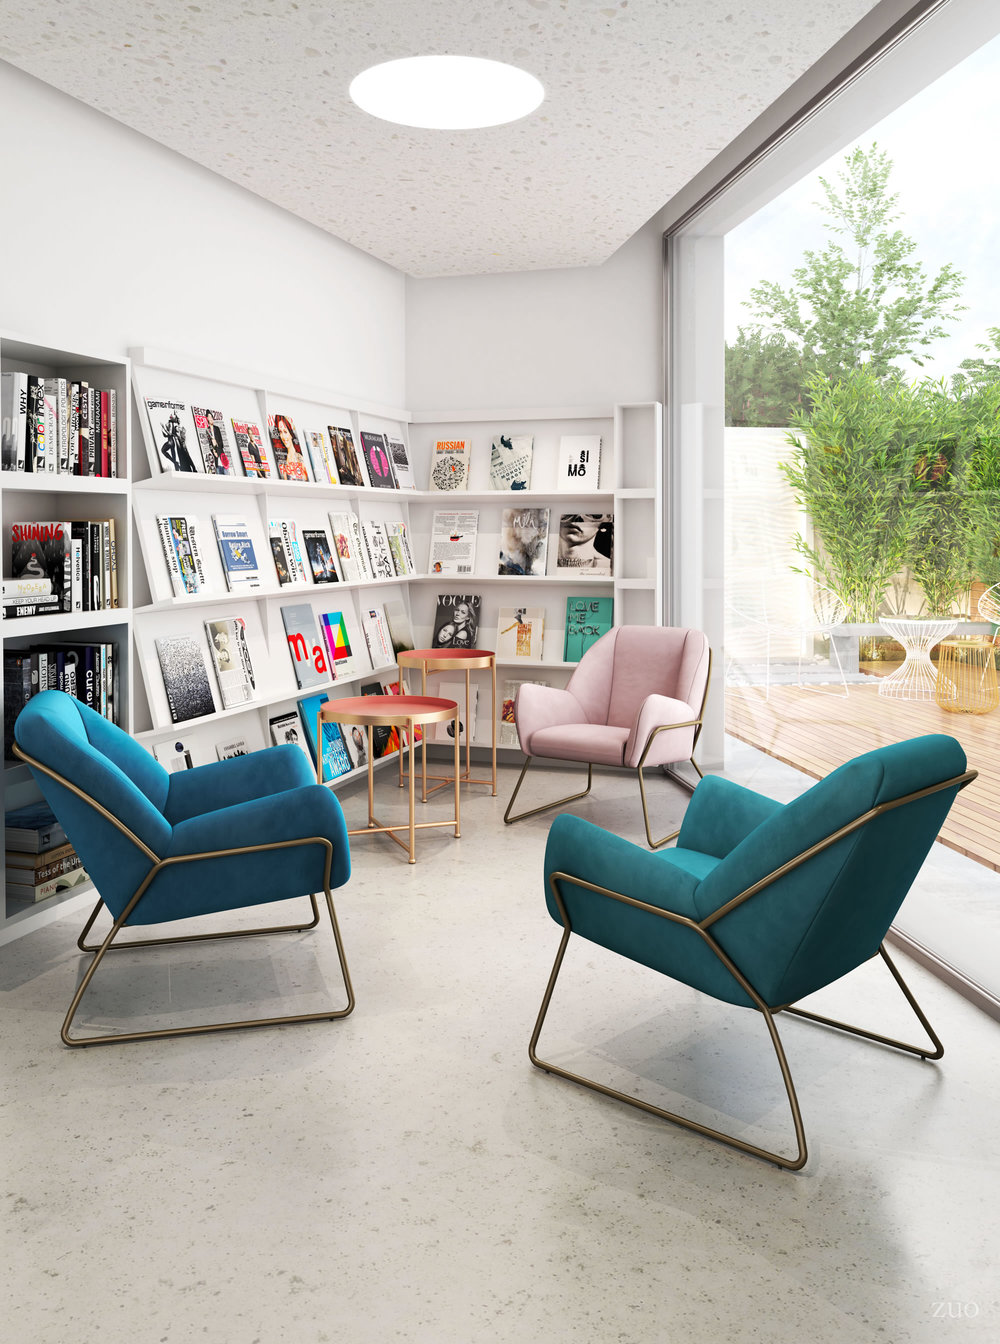 Zuo Modern Contemporary - Stanza Arm Chair Pink